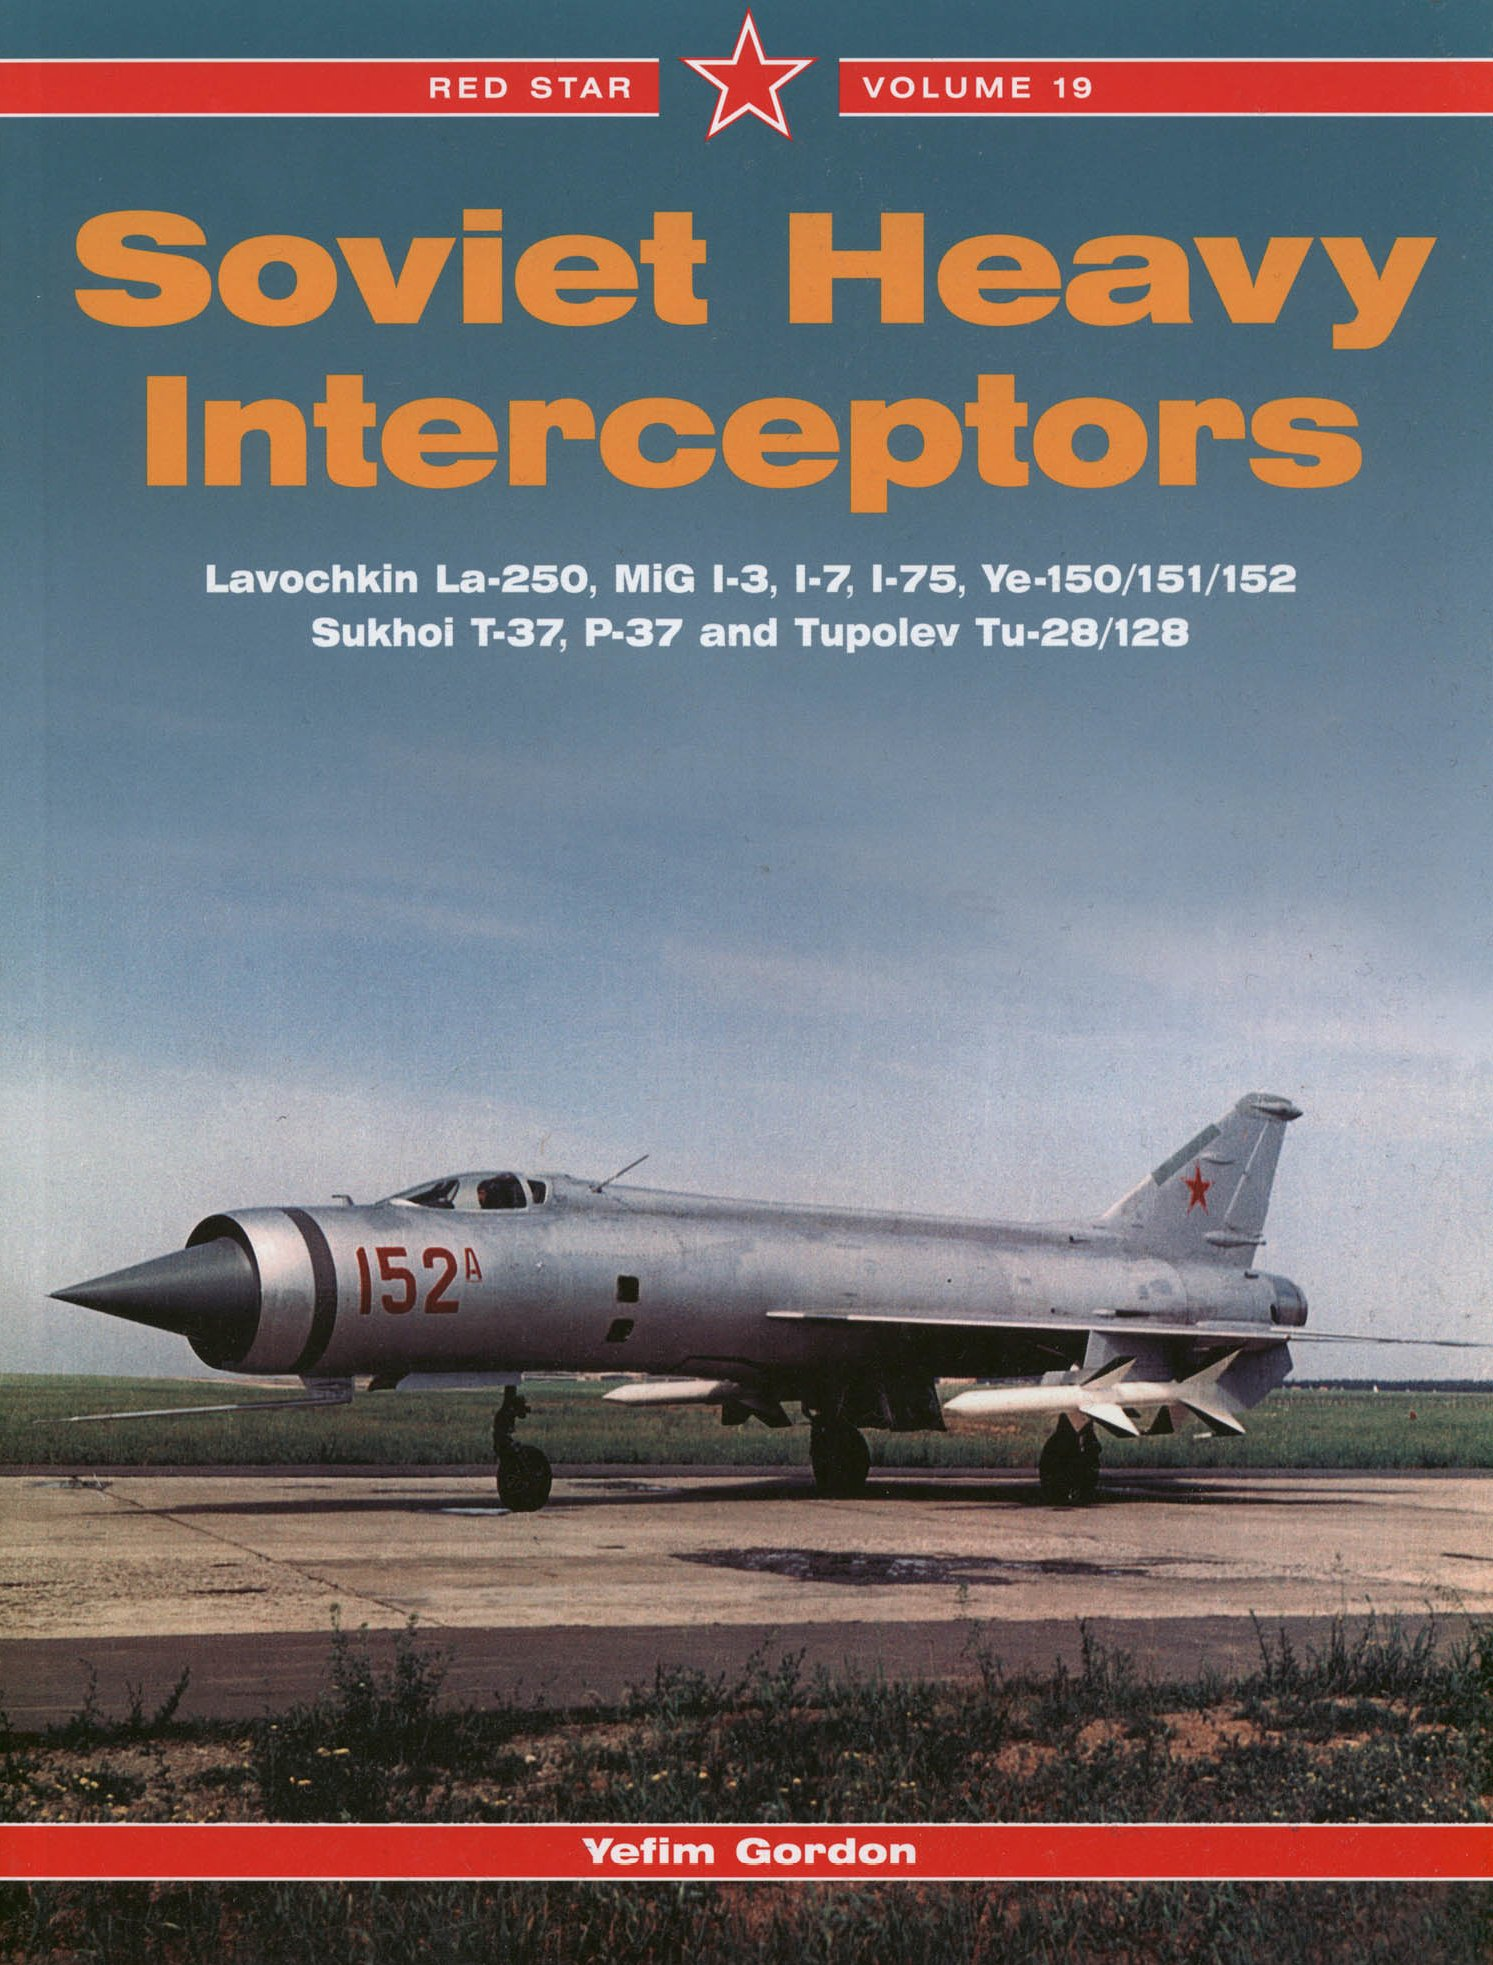 Mikoyan-Gourevitch E-152M  - Modelsvit #72030 - 1/72ème. Imagep18